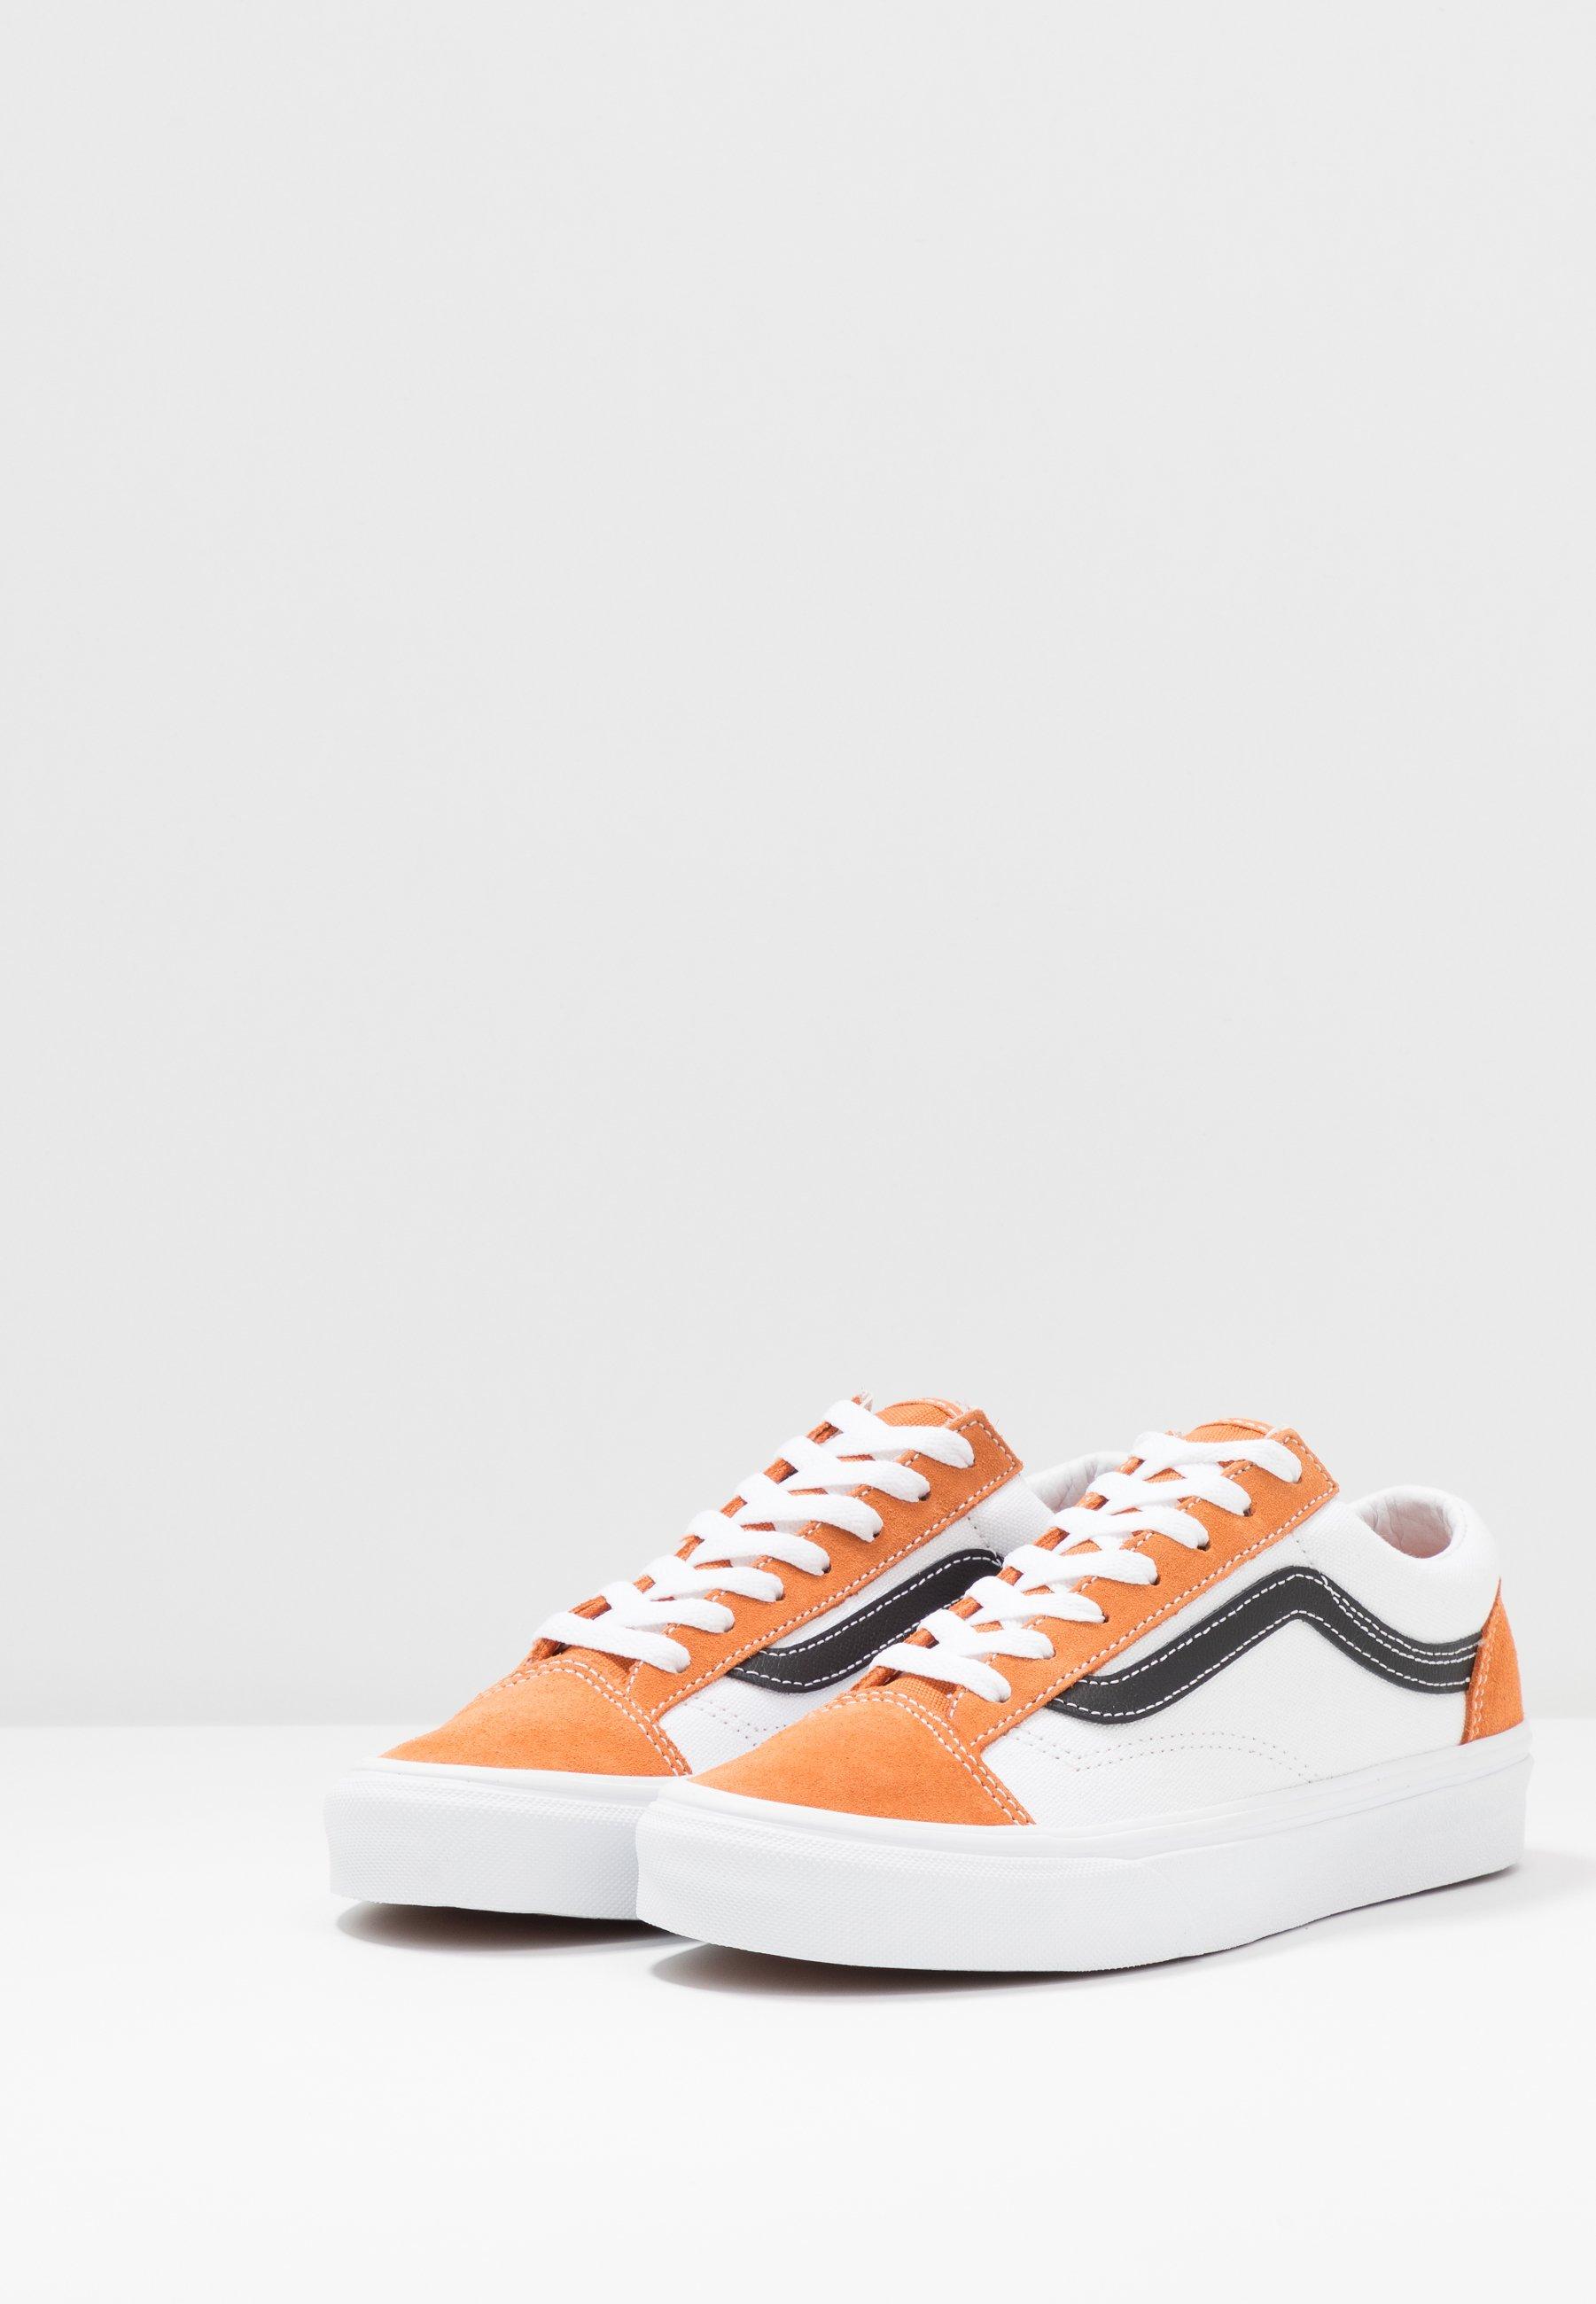 Vans Style 36 - Baskets Basses Apricot Buff/true White